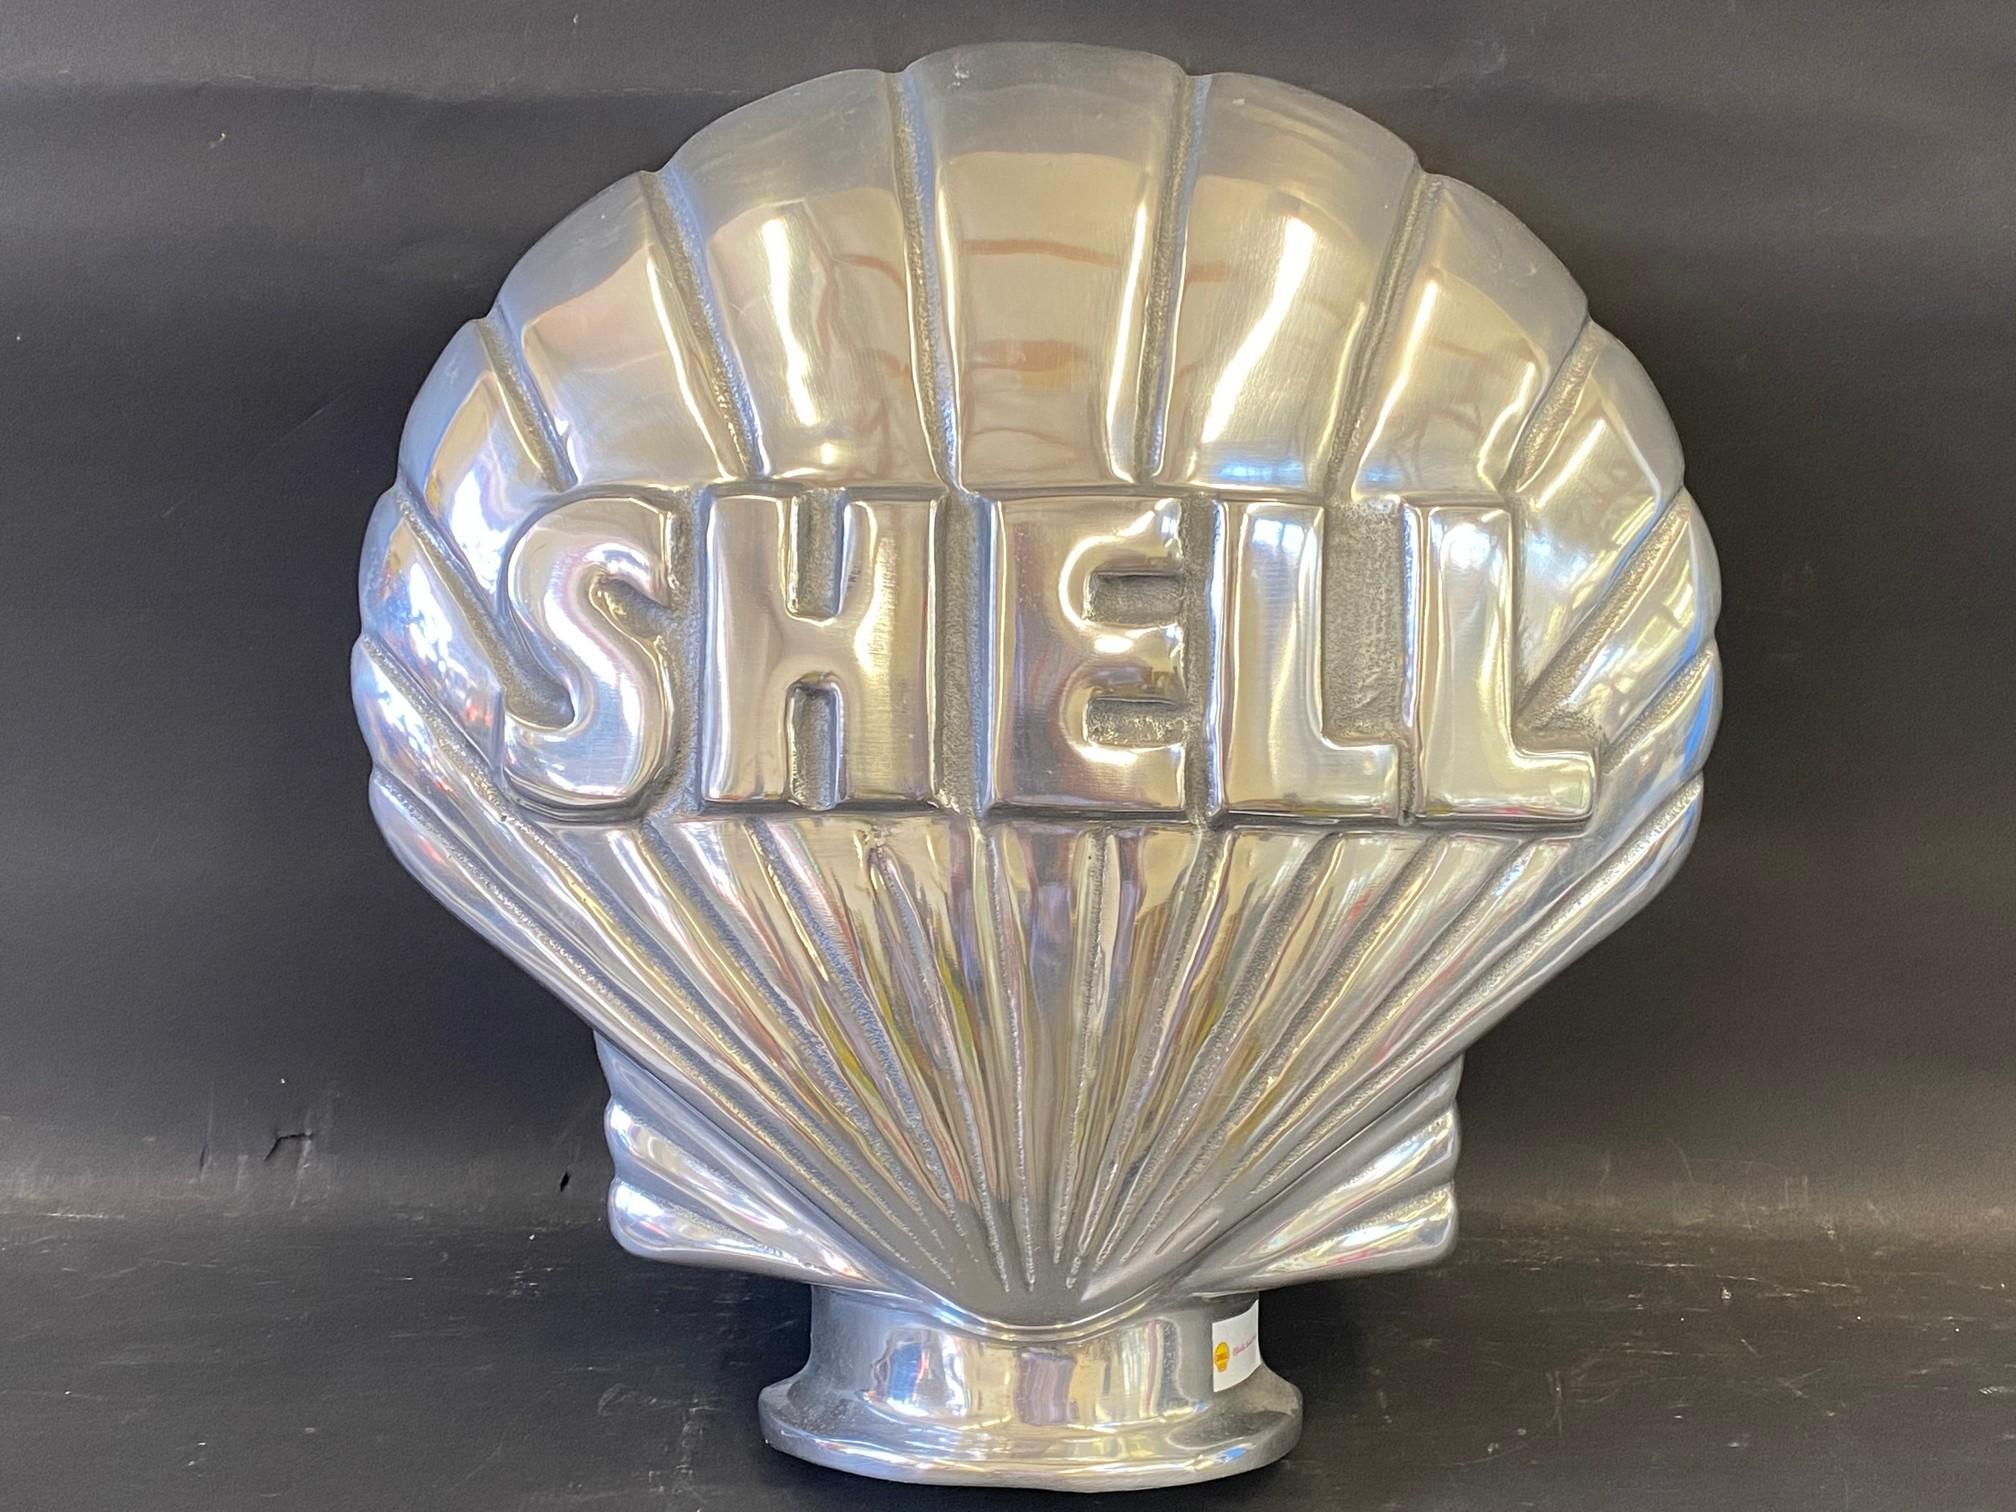 A contemporary polished aluminium clam Shell sign, 16 1/2 x 16 1/2.